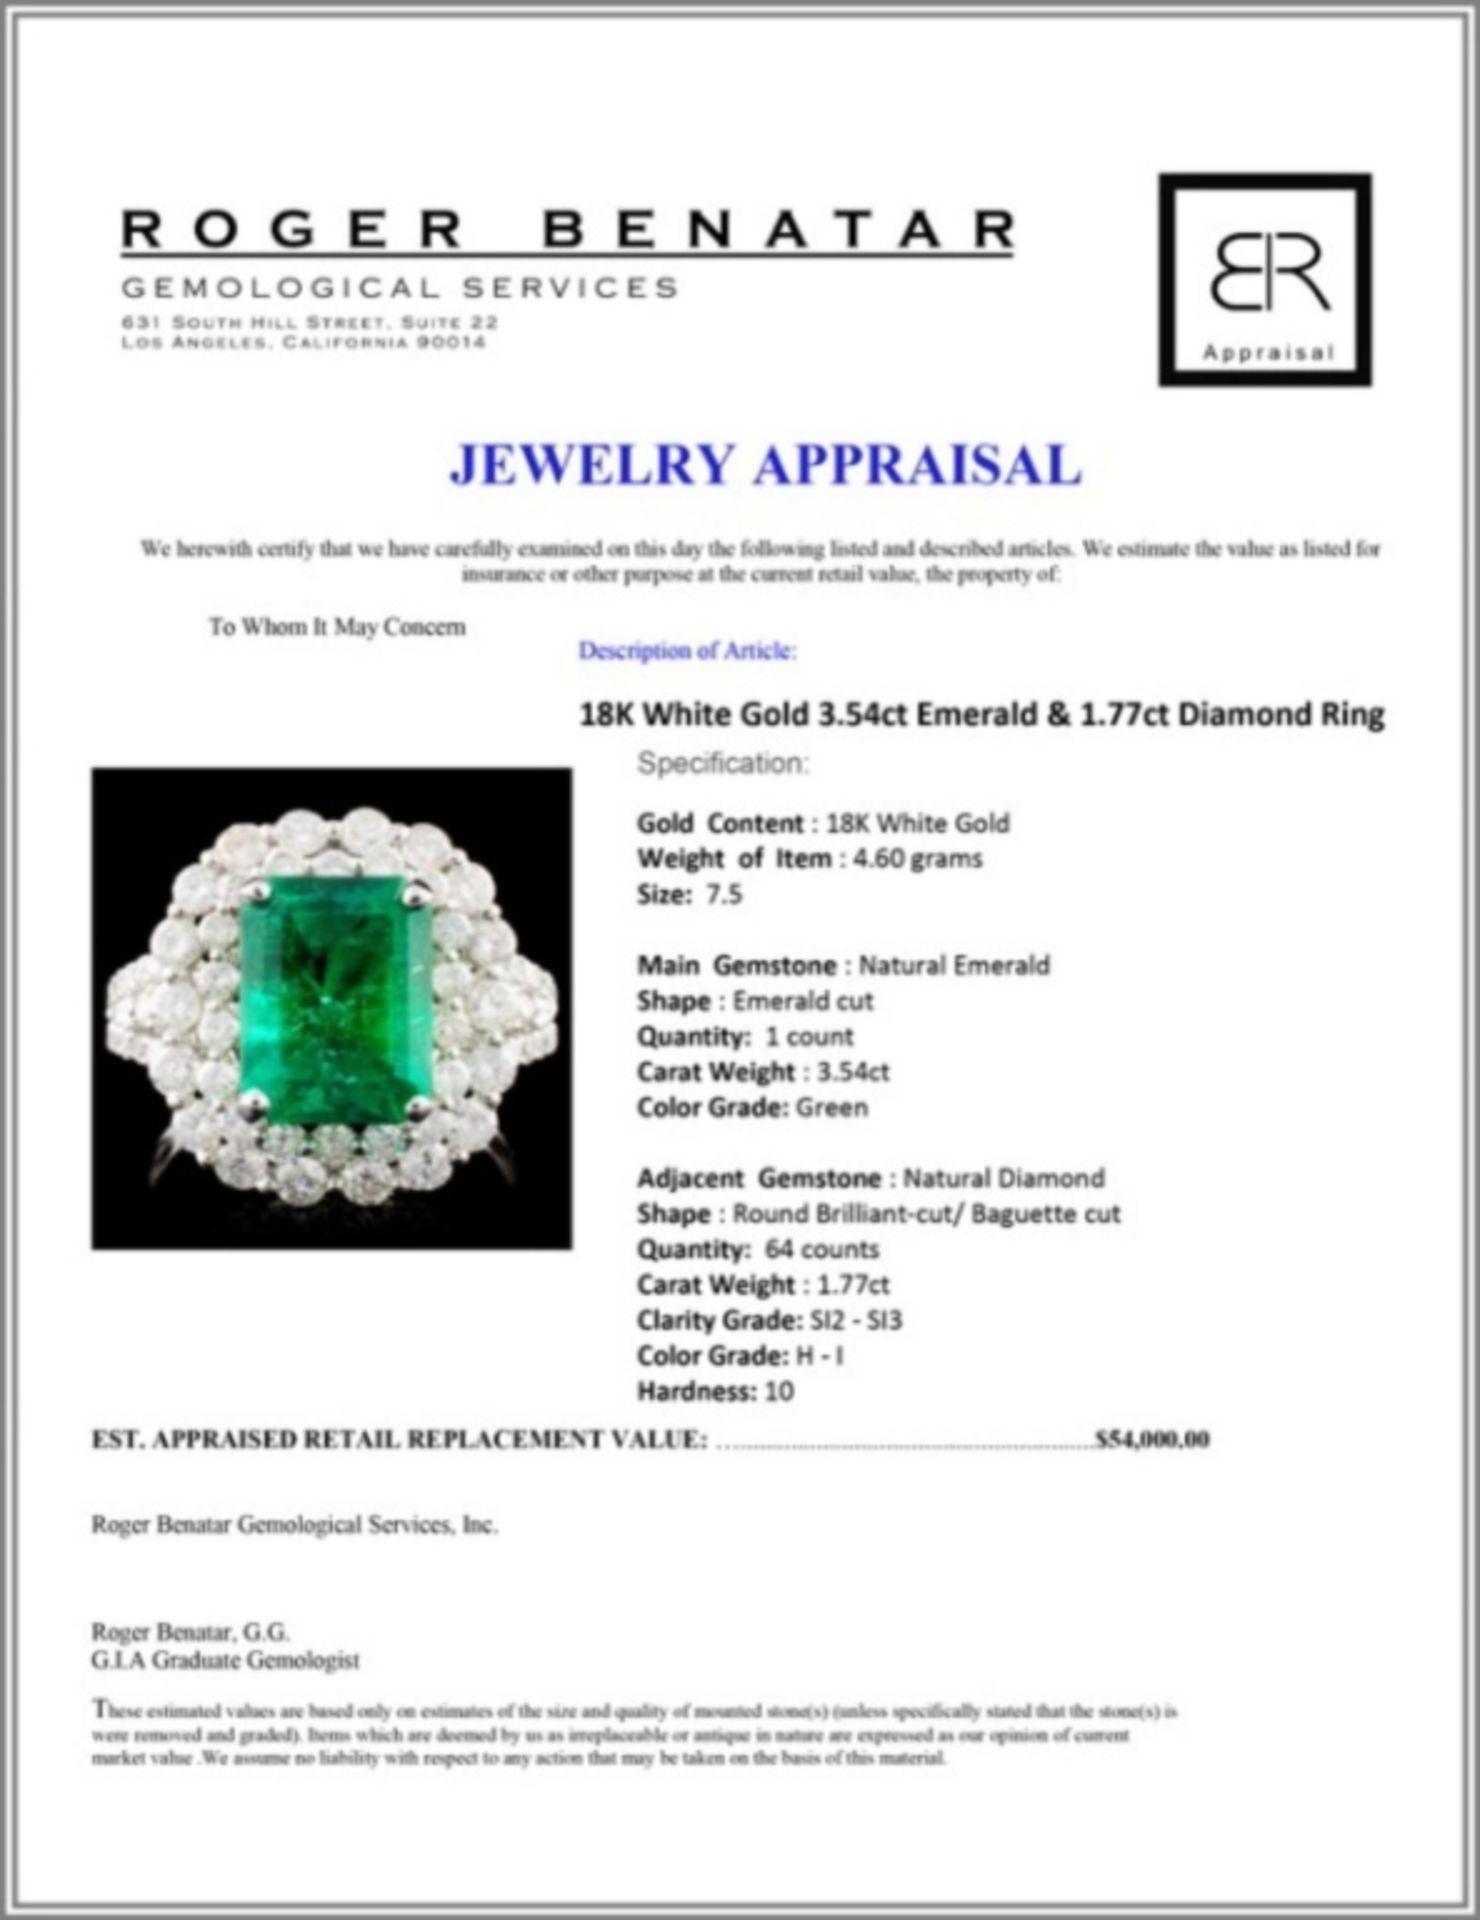 18K W Gold 3.54ct Emerald & 1.77ct Diamond Ring - Image 4 of 4